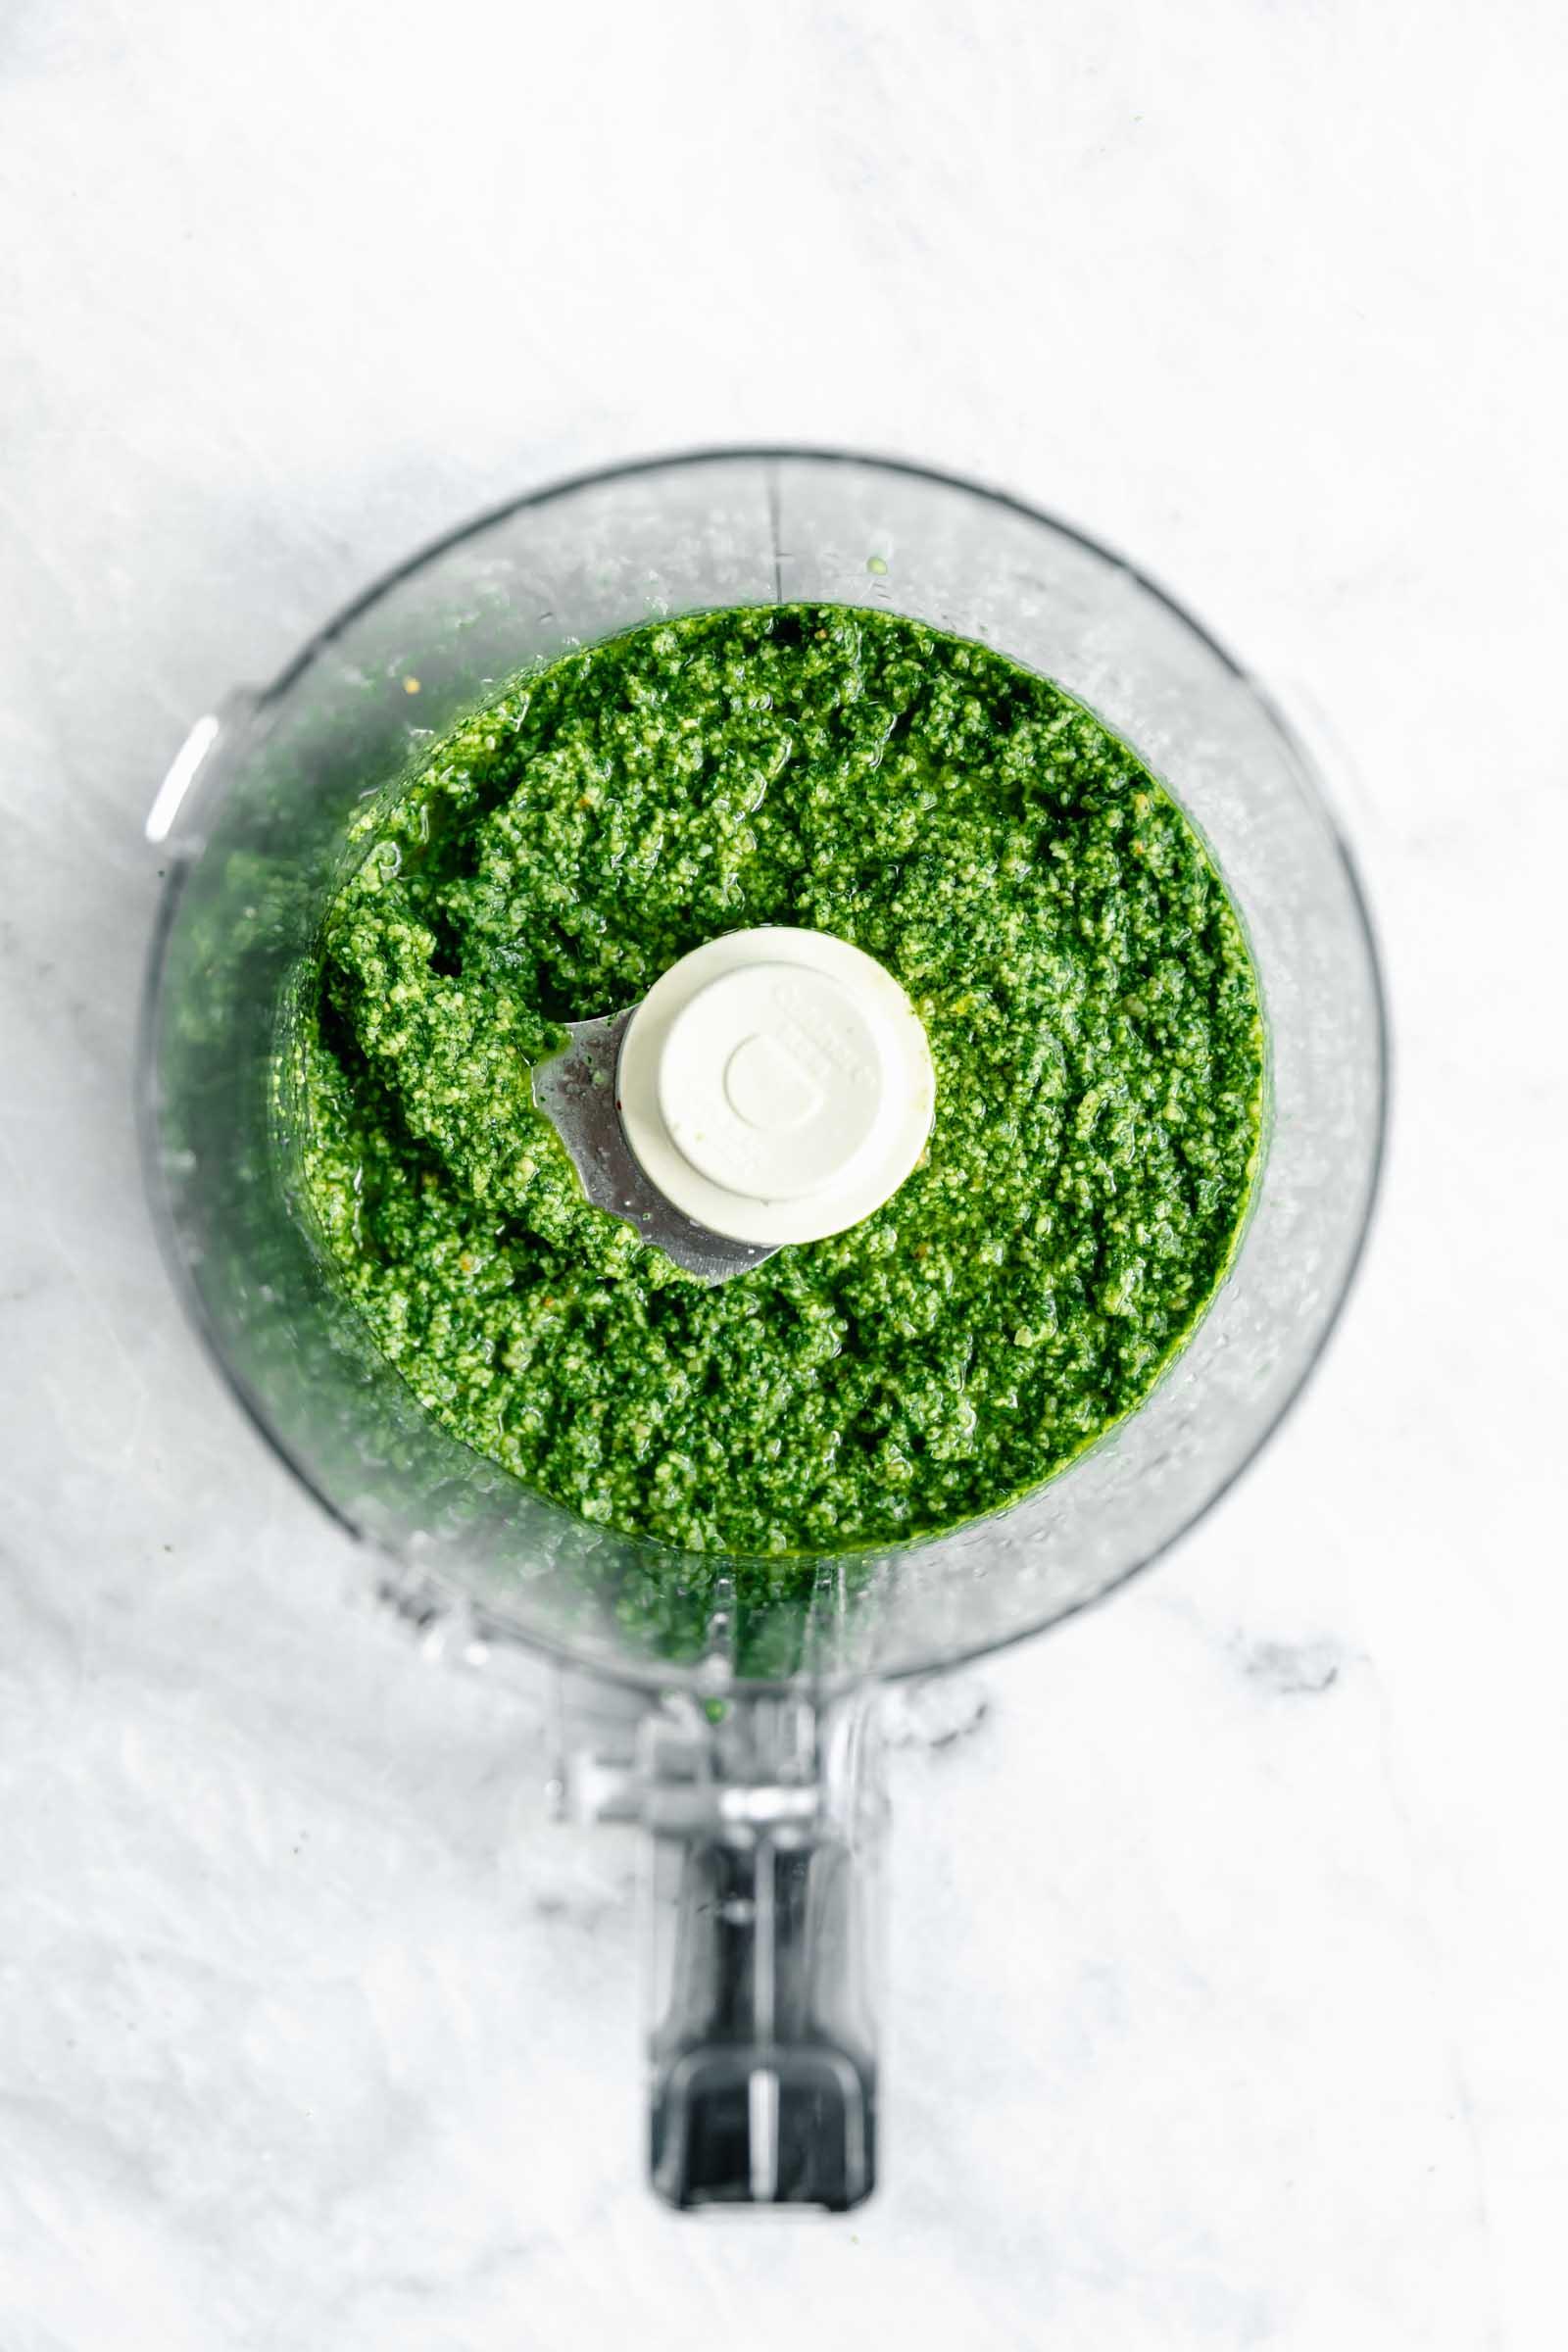 homemade pesto blended in food processor